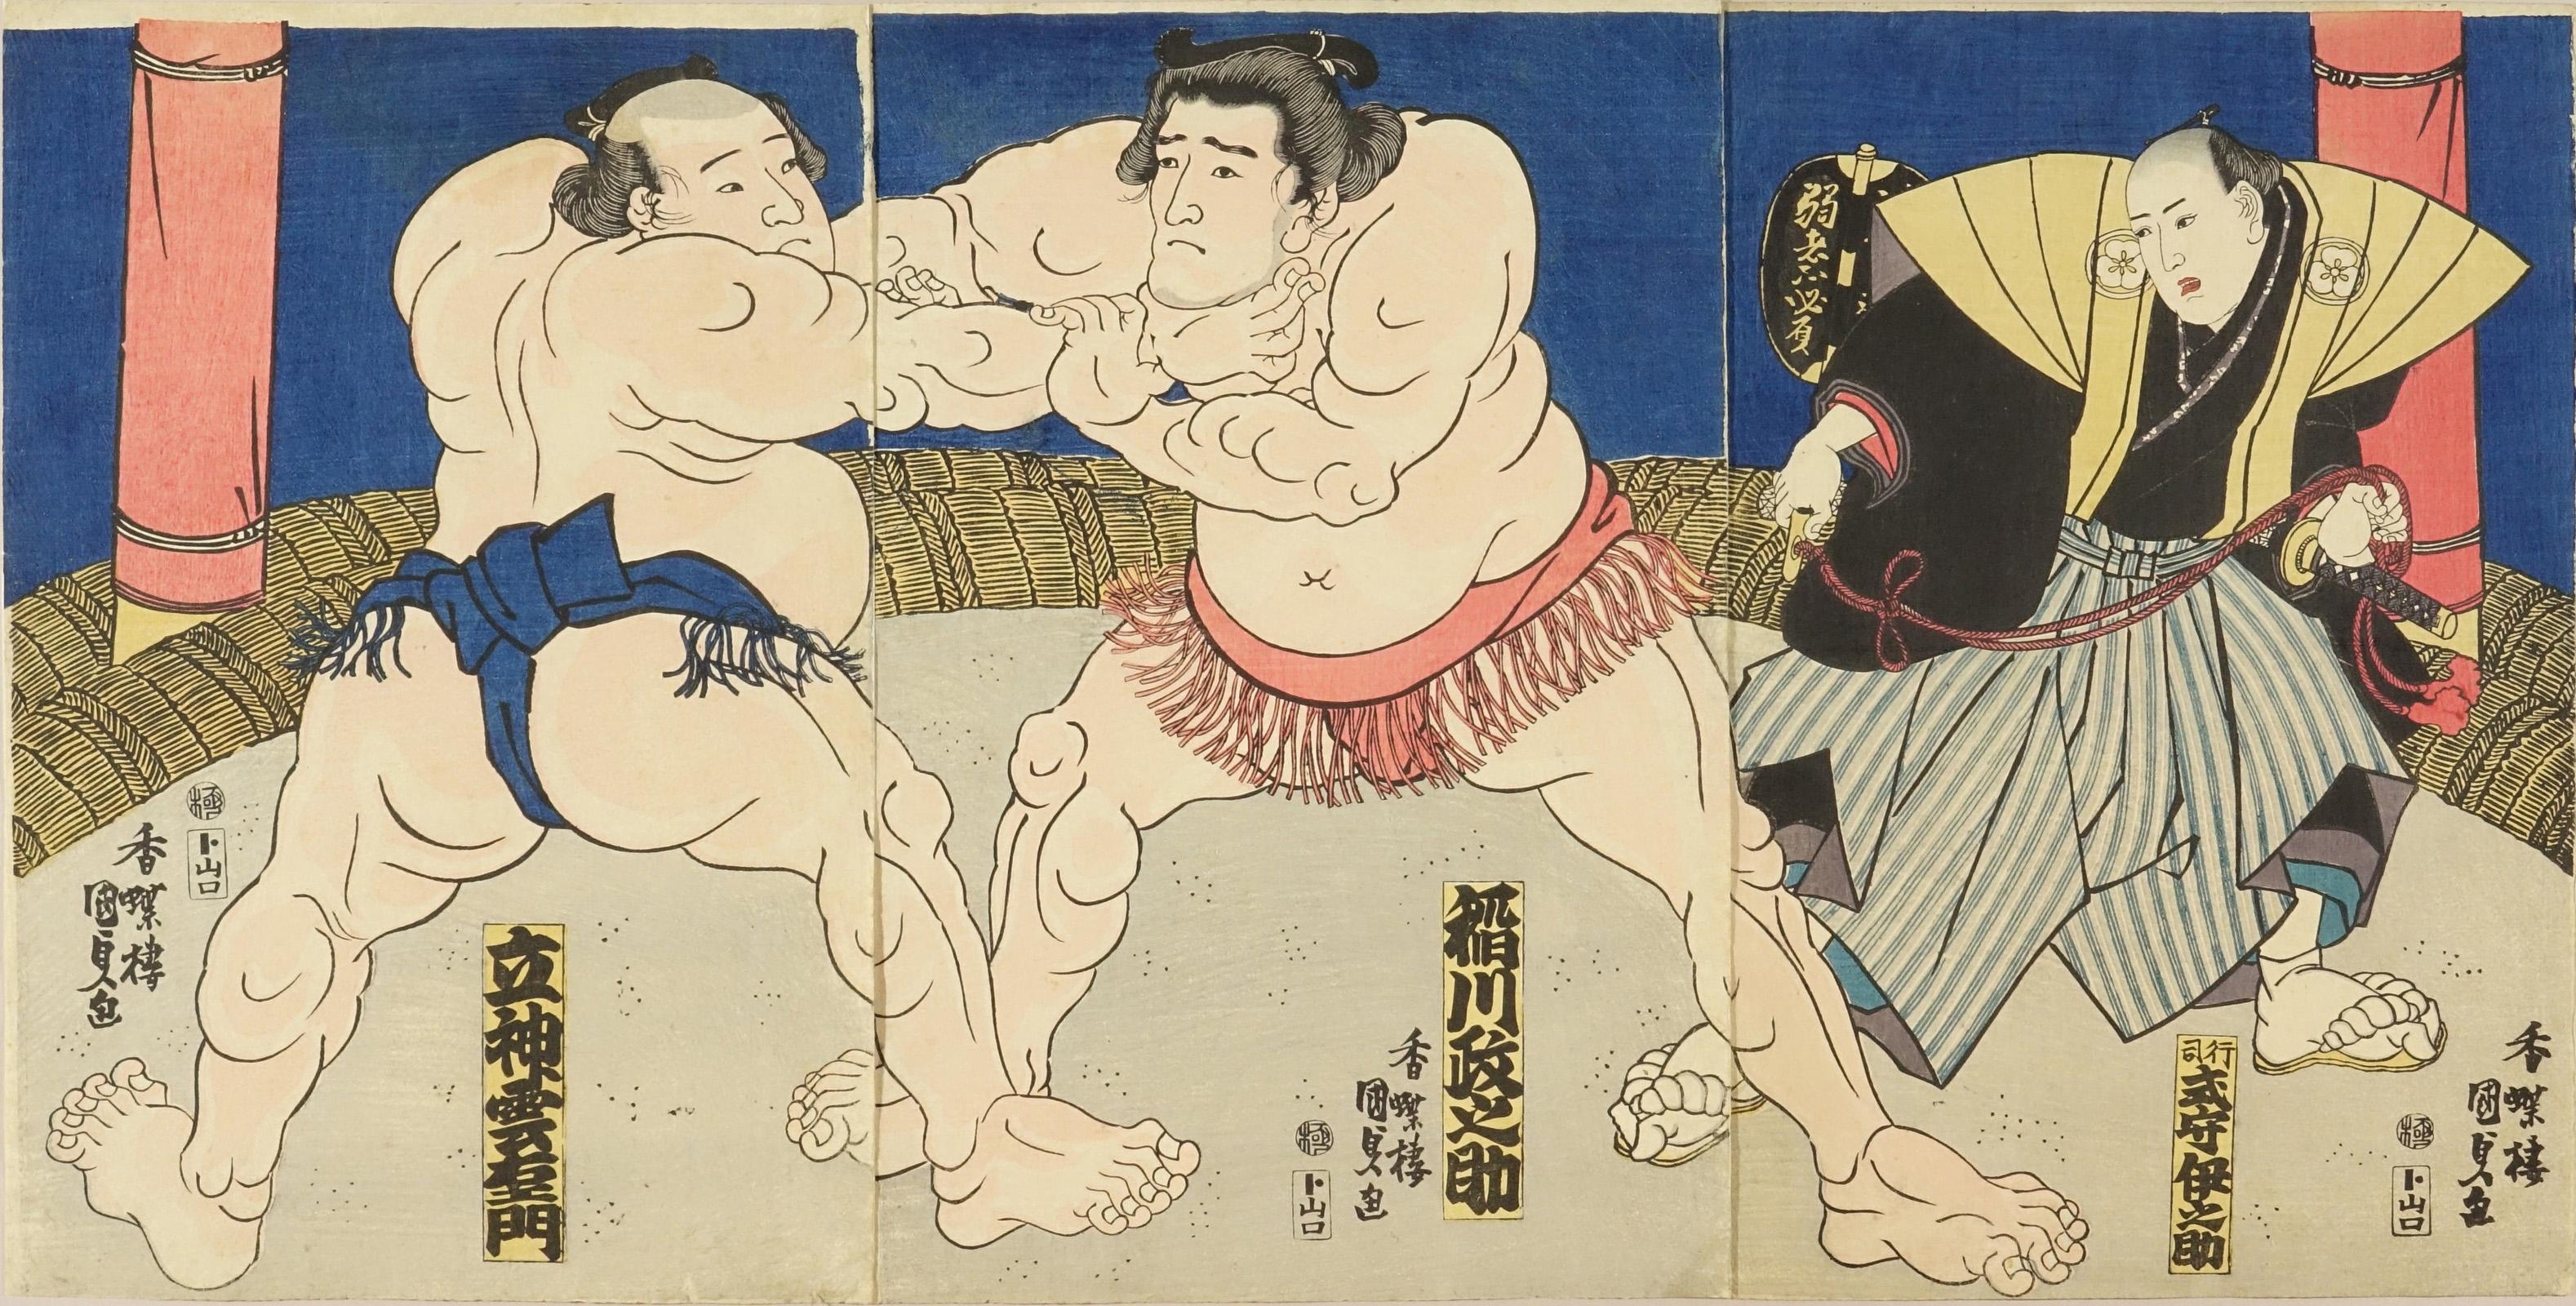 KUNISADA Sumo bout between Inagawa Masaske (Chiba Pref.) and Tatugami Kumoemon, triptych